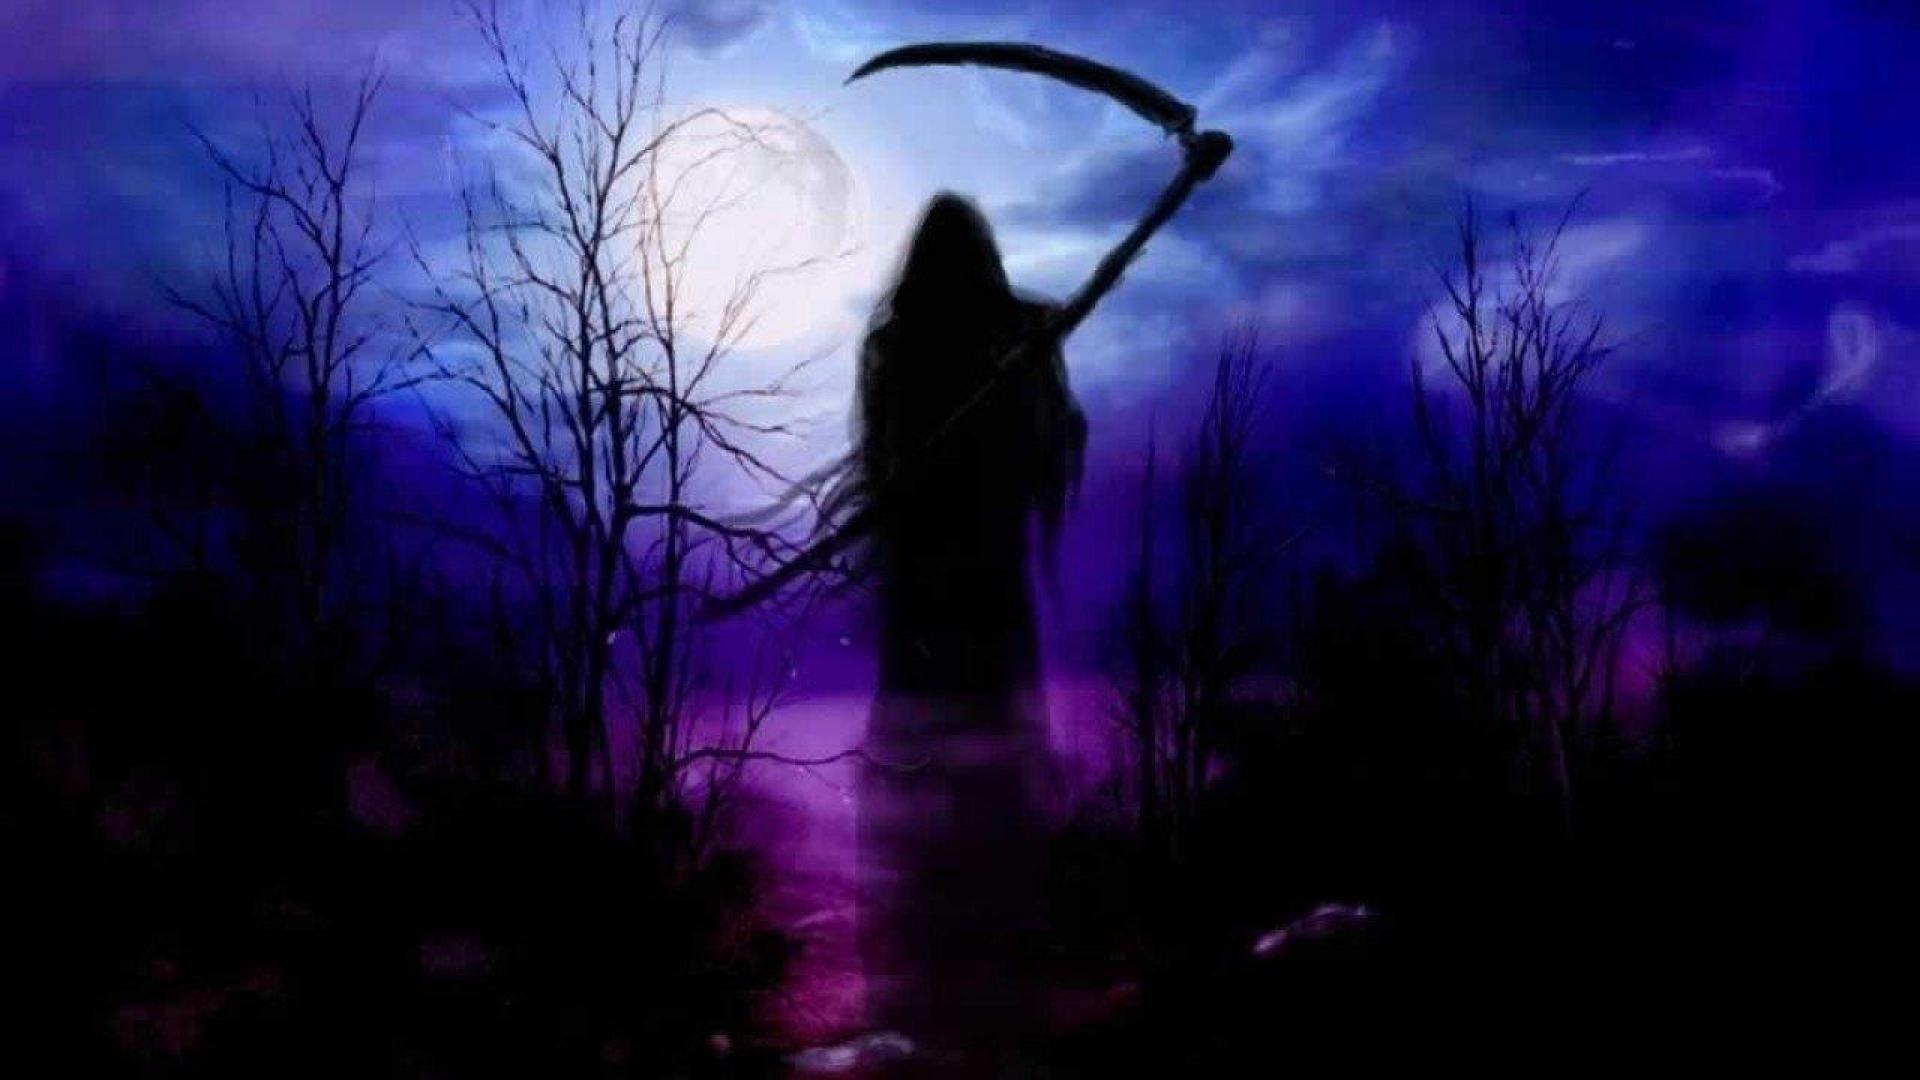 Grim Reaper wallpaper ·① Download free stunning full HD ...